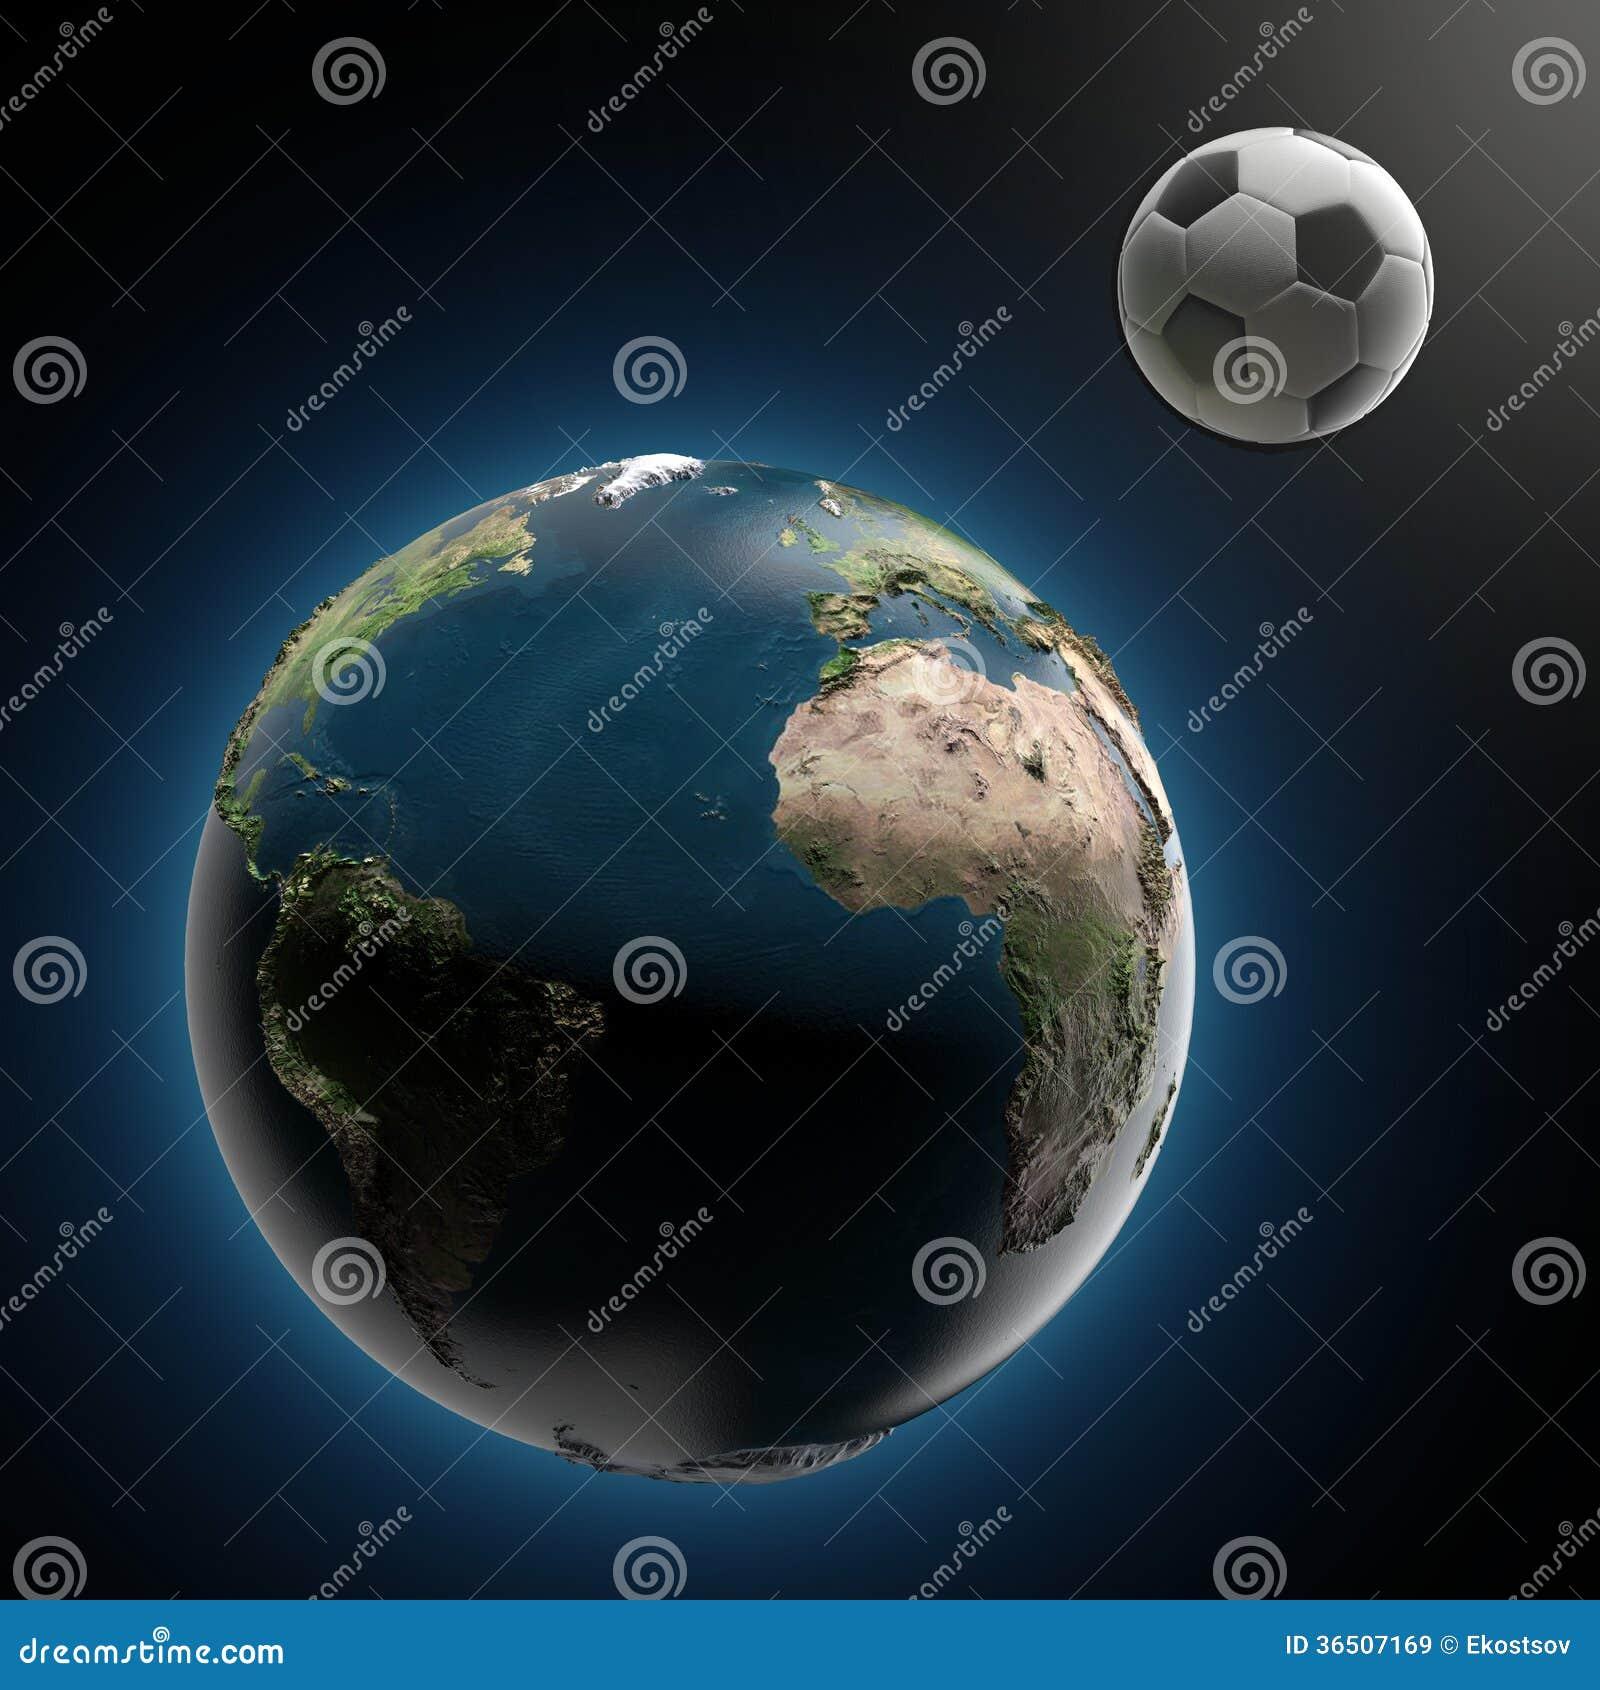 La terre et ballon de football (éléments meublés par la NASA)